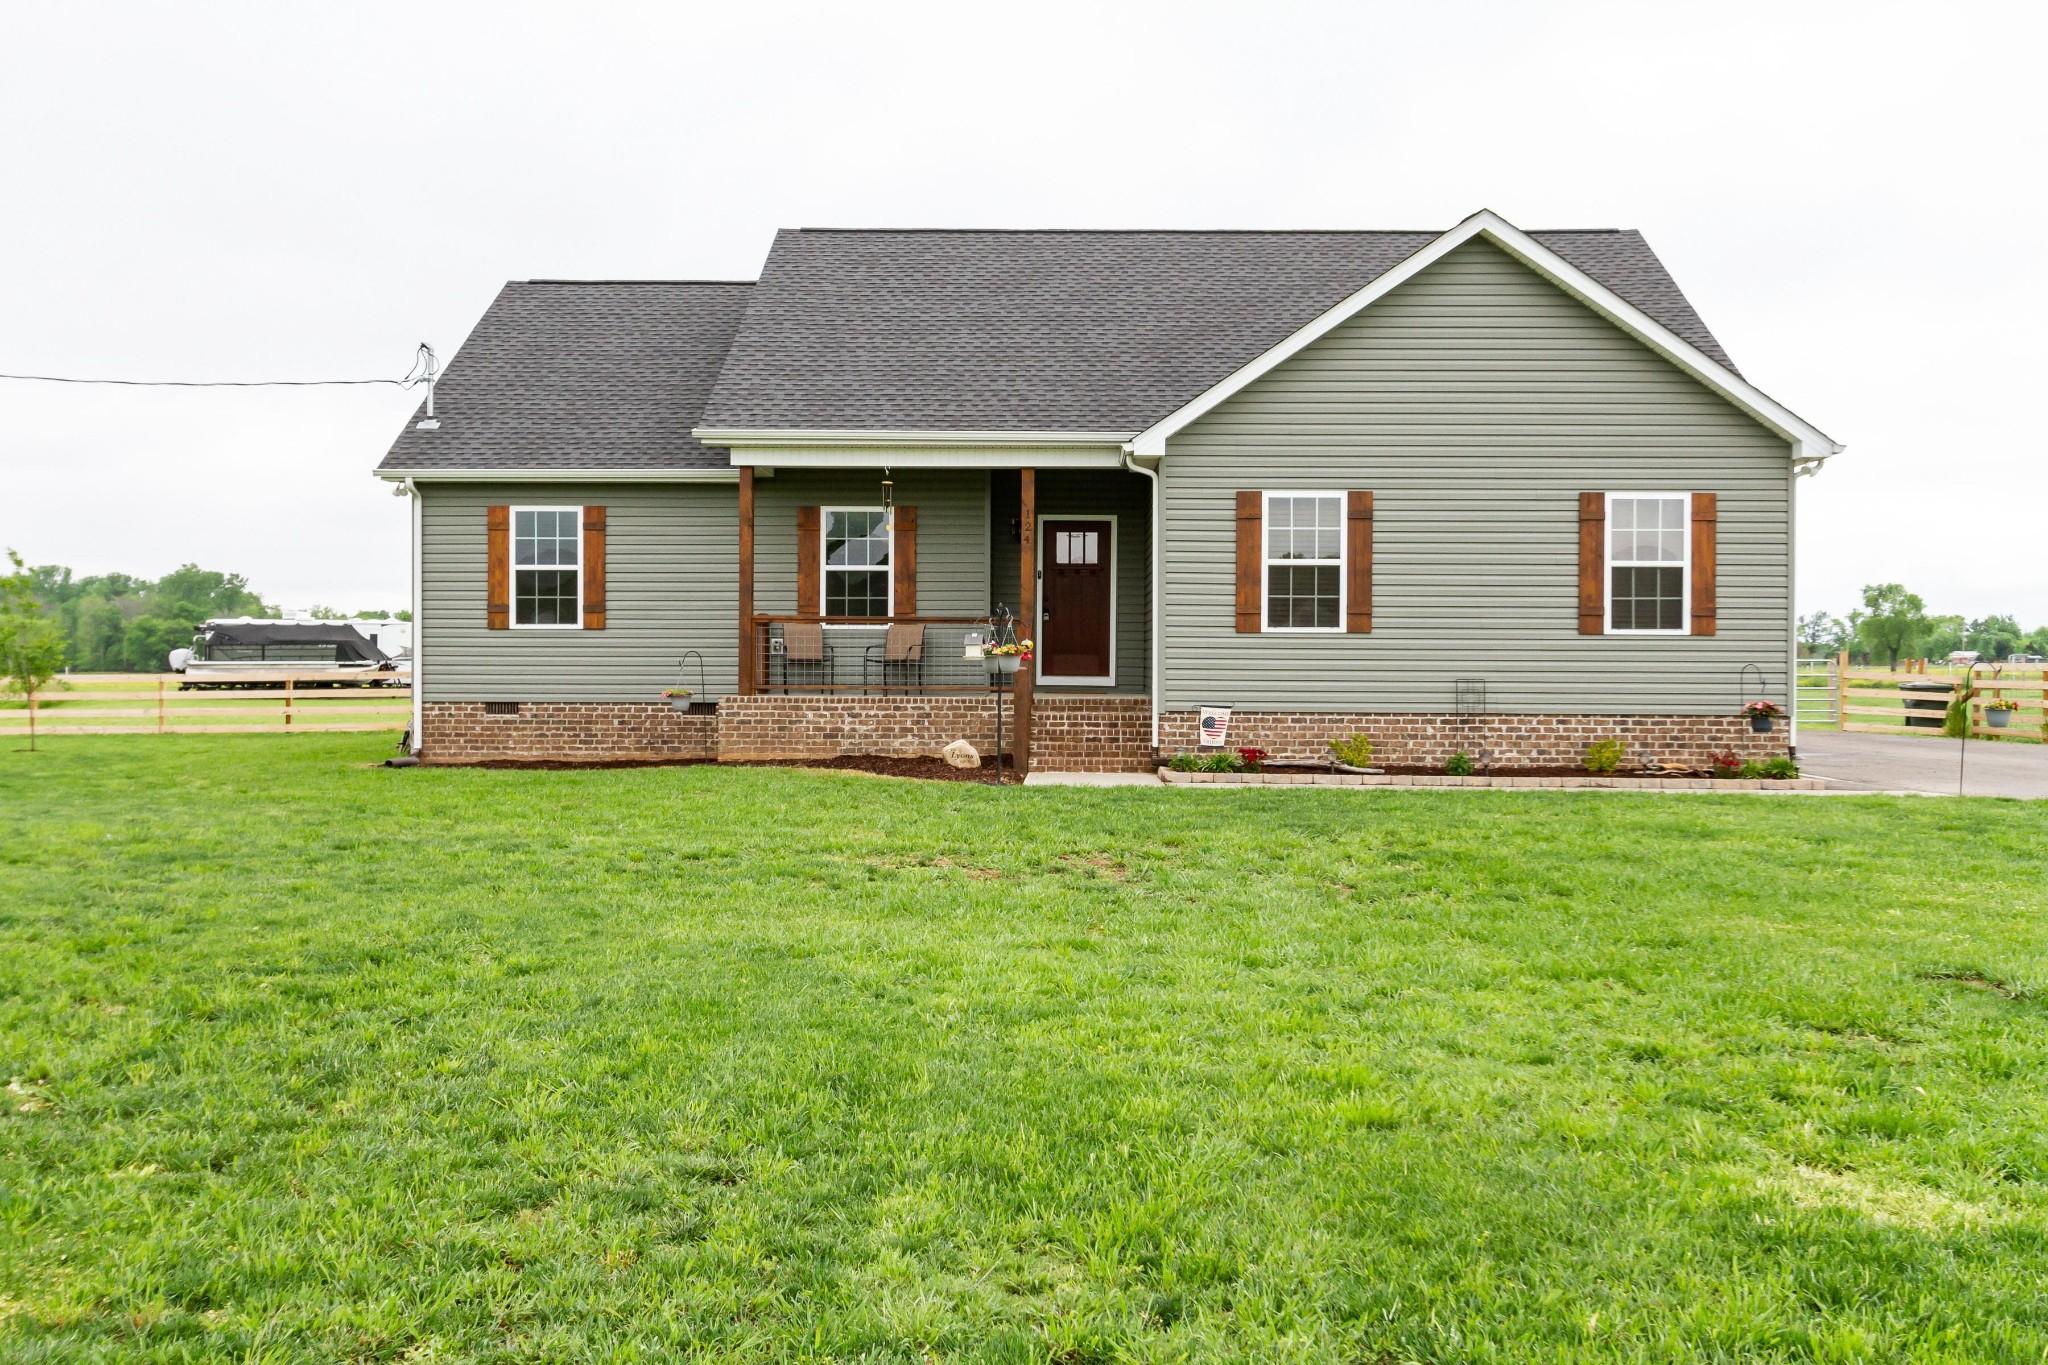 124 Hazelnut Ln Property Photo - Unionville, TN real estate listing